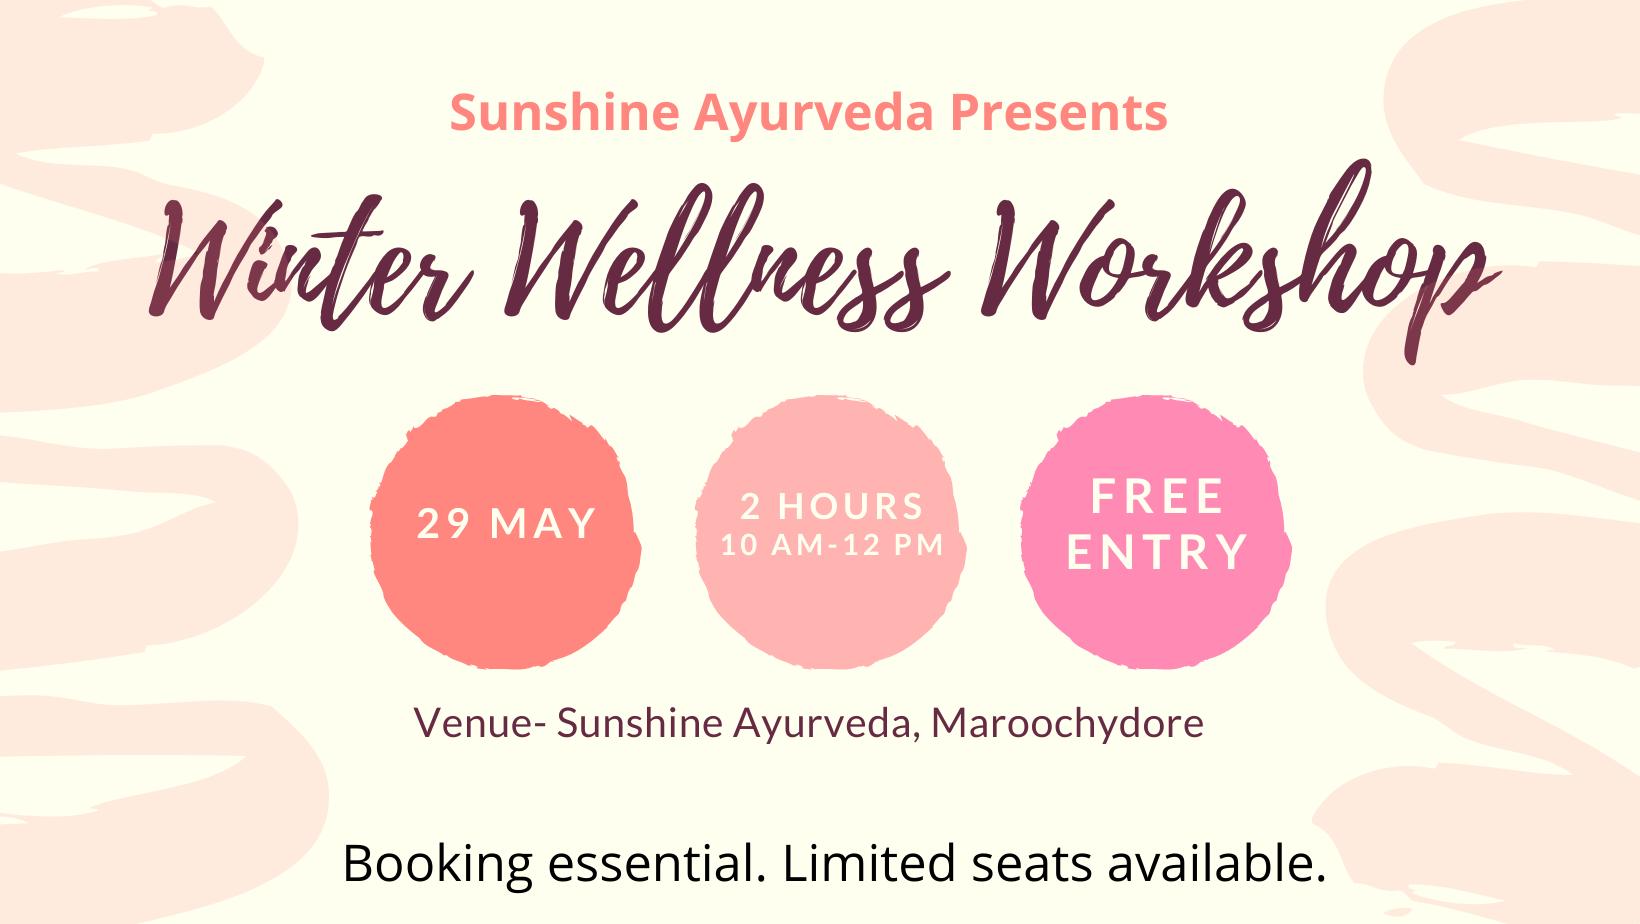 Ayurvedic Winter Wellness Workshop – Free Event